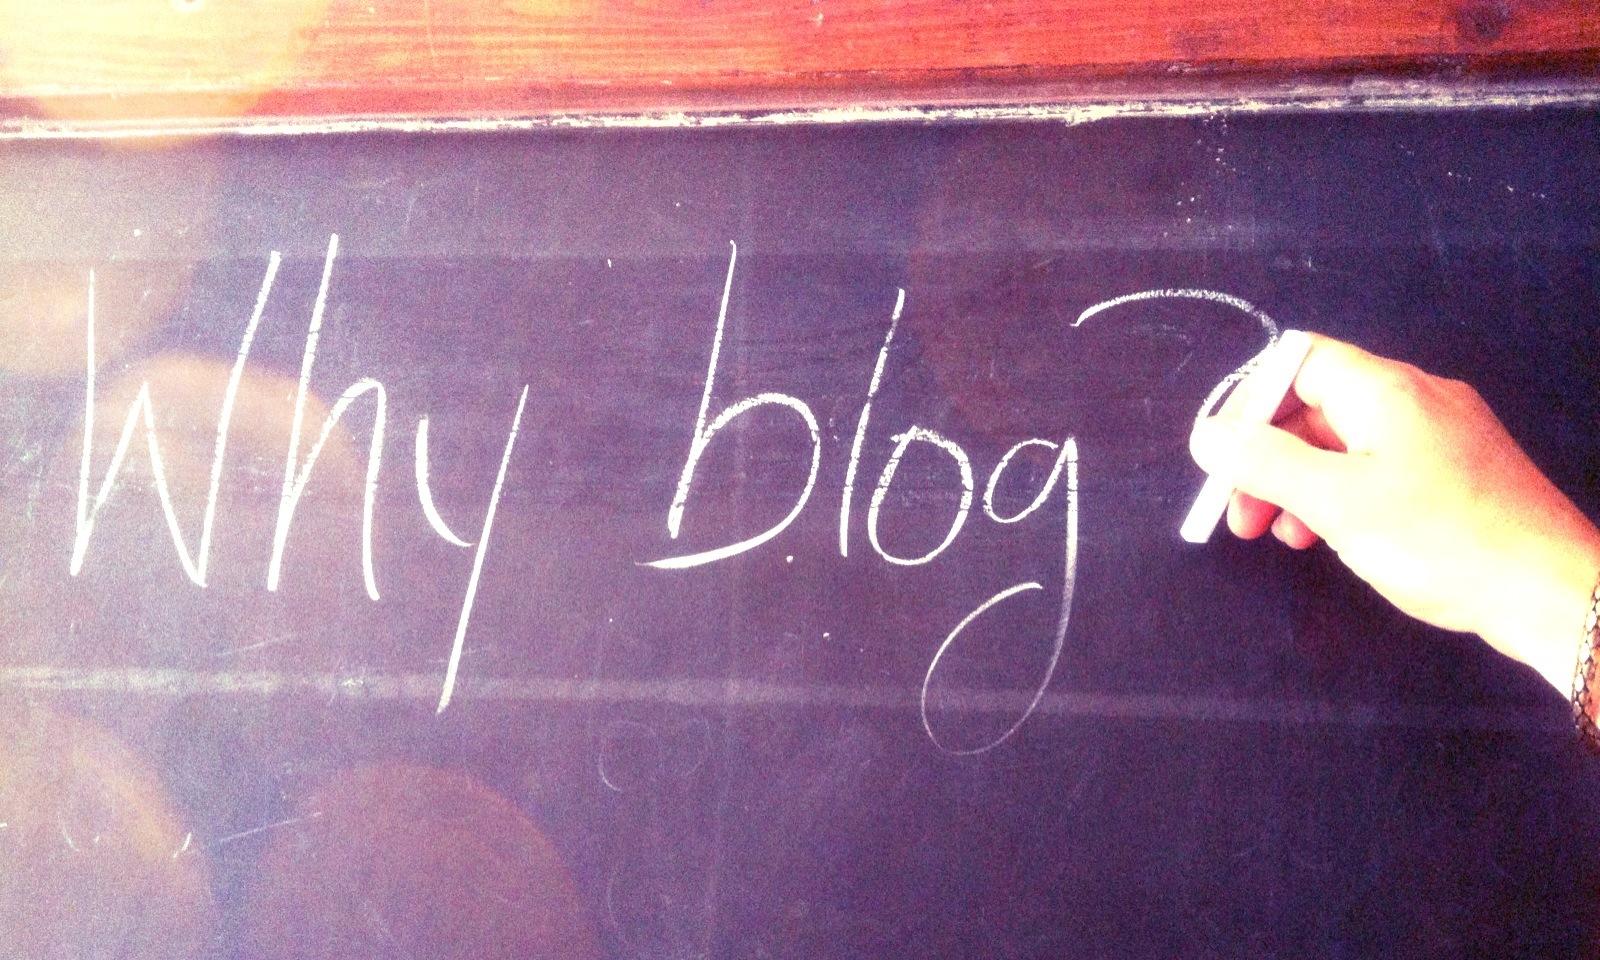 http://www.lastwordonnothing.com/wp-content/uploads/2012/05/WhyBlogAschwanden.jpg